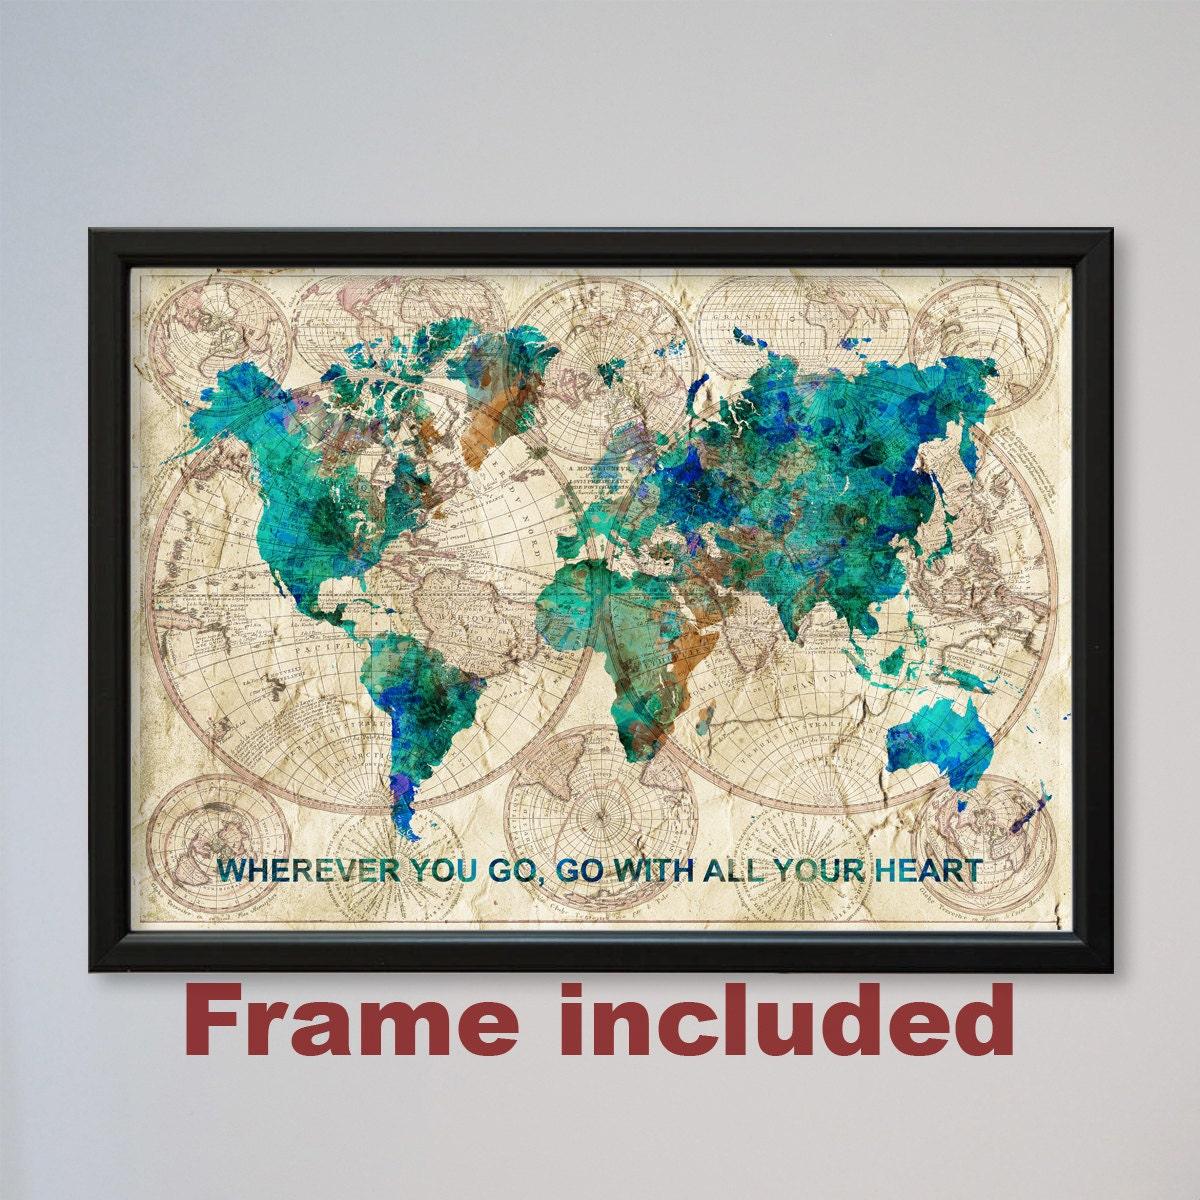 Welt Karte gerahmt Konfuzius Zitat Aquarell Druck Poster alte | Etsy